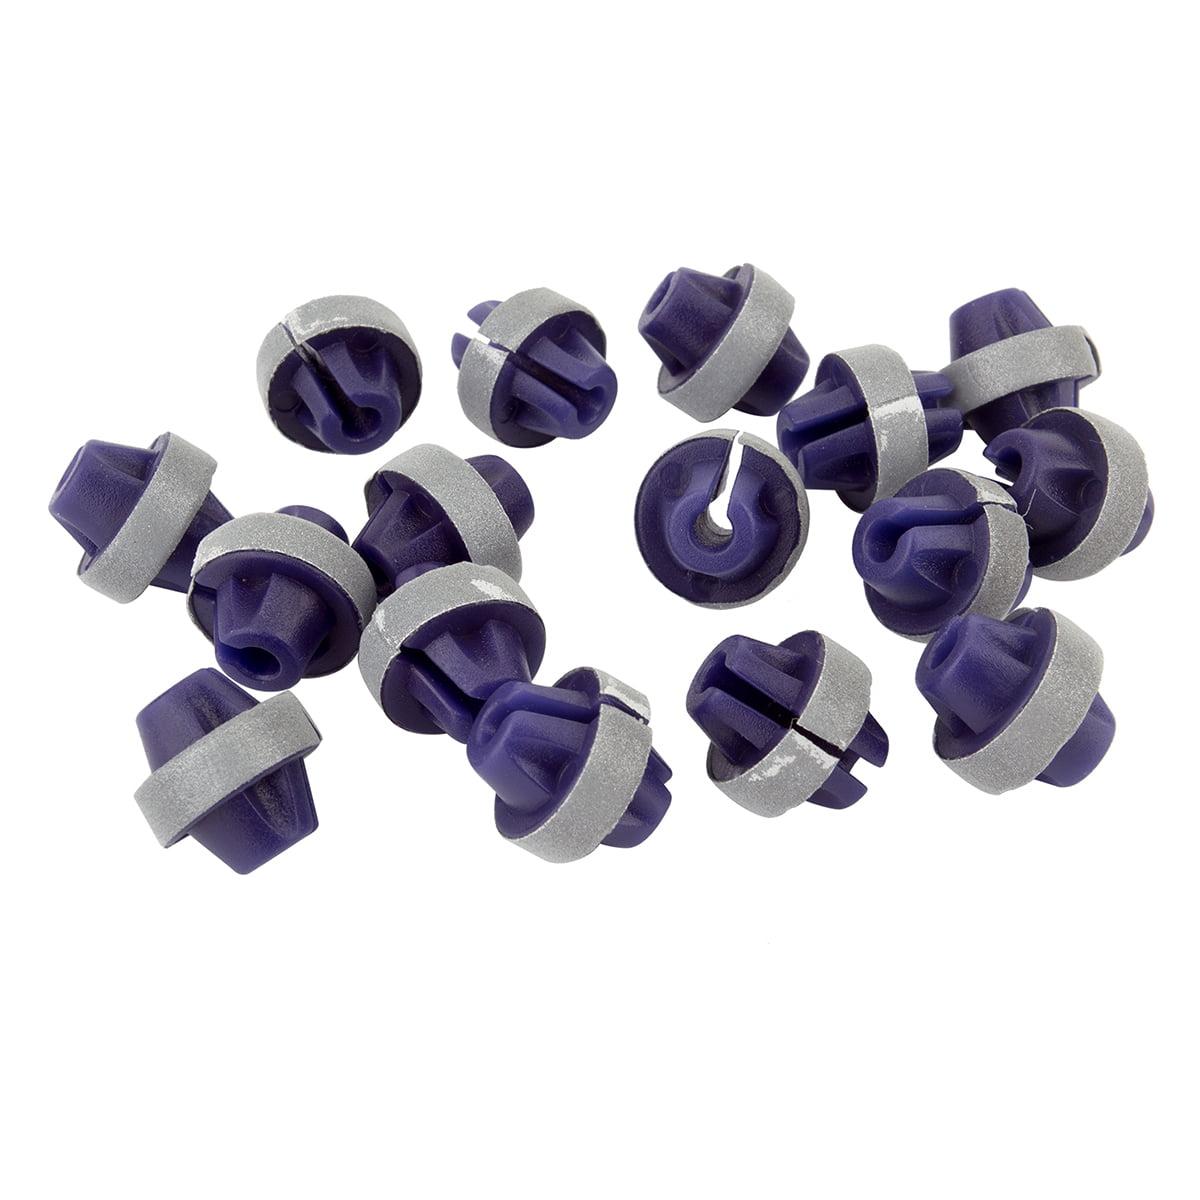 Sunlite Spoke Beads Reflective Purple